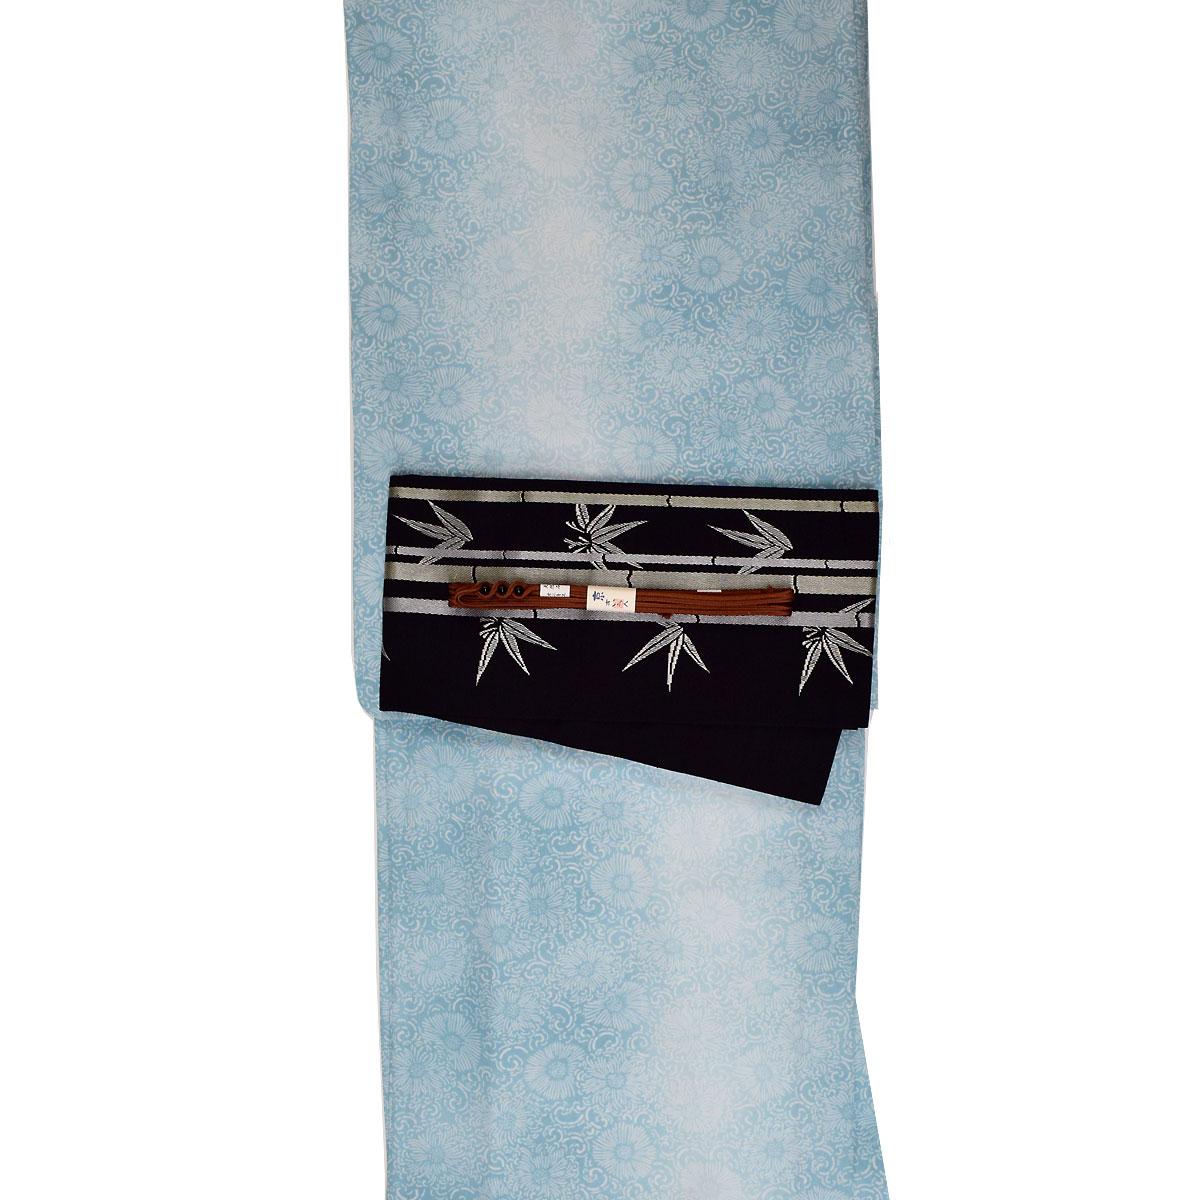 【L寸】【 単衣 】 洗える着物 セット【国産生地】【上質生地】 洗える着物 + 正絹 博多 半幅帯 + 正絹 三分紐 番号d808-94【h805】